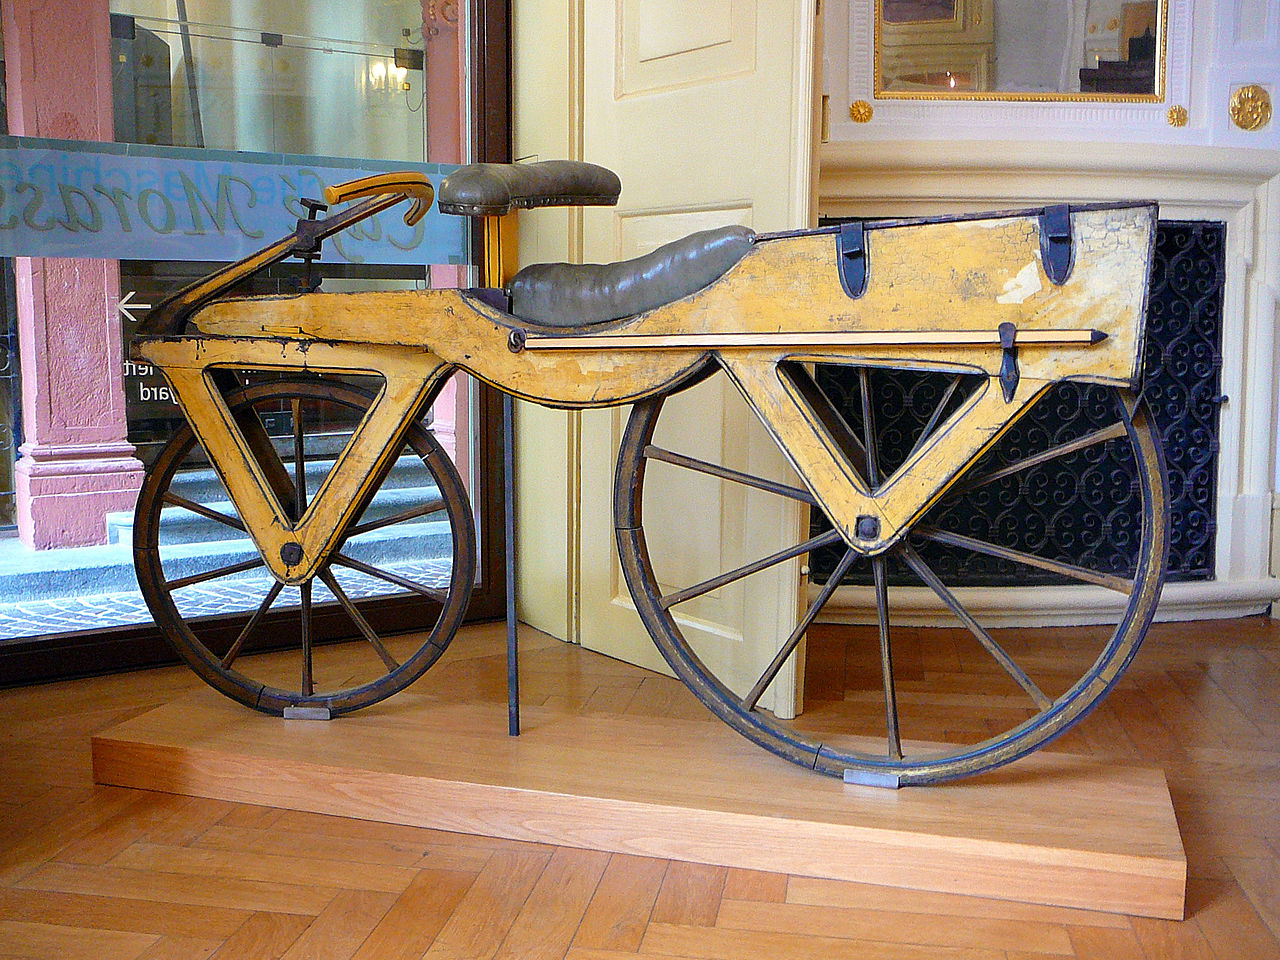 Drausiana de Karl Christian Ludwig Drais von Sauerbronn. Precursora de la bicicleta